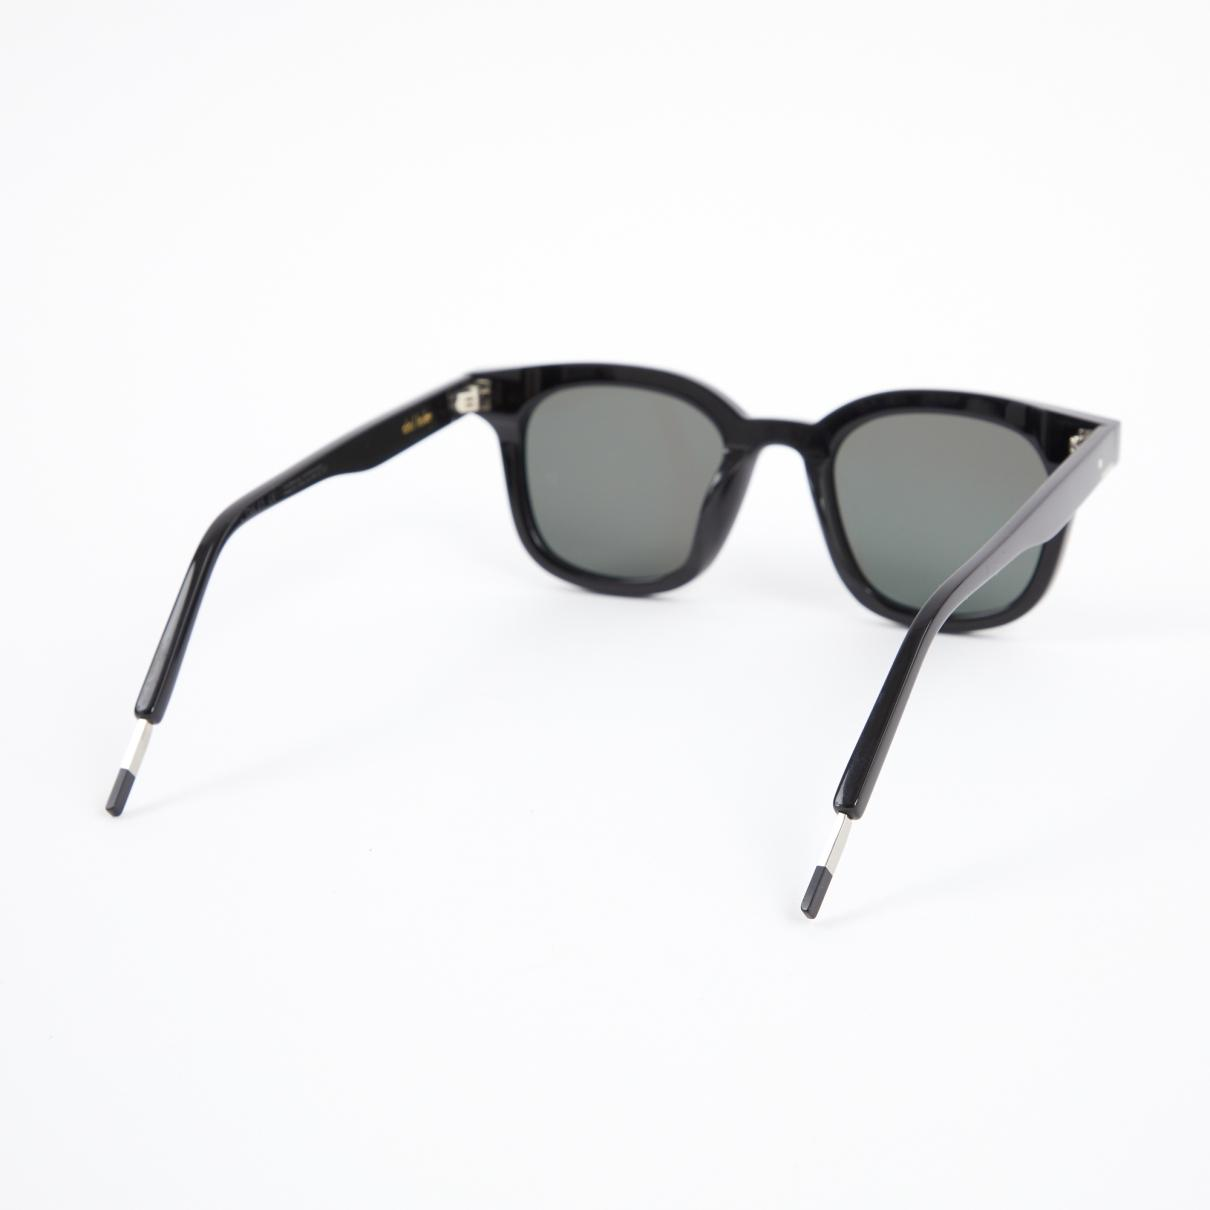 38de38d94367a Gentle Monster - Black Plastic Sunglasses - Lyst. View fullscreen